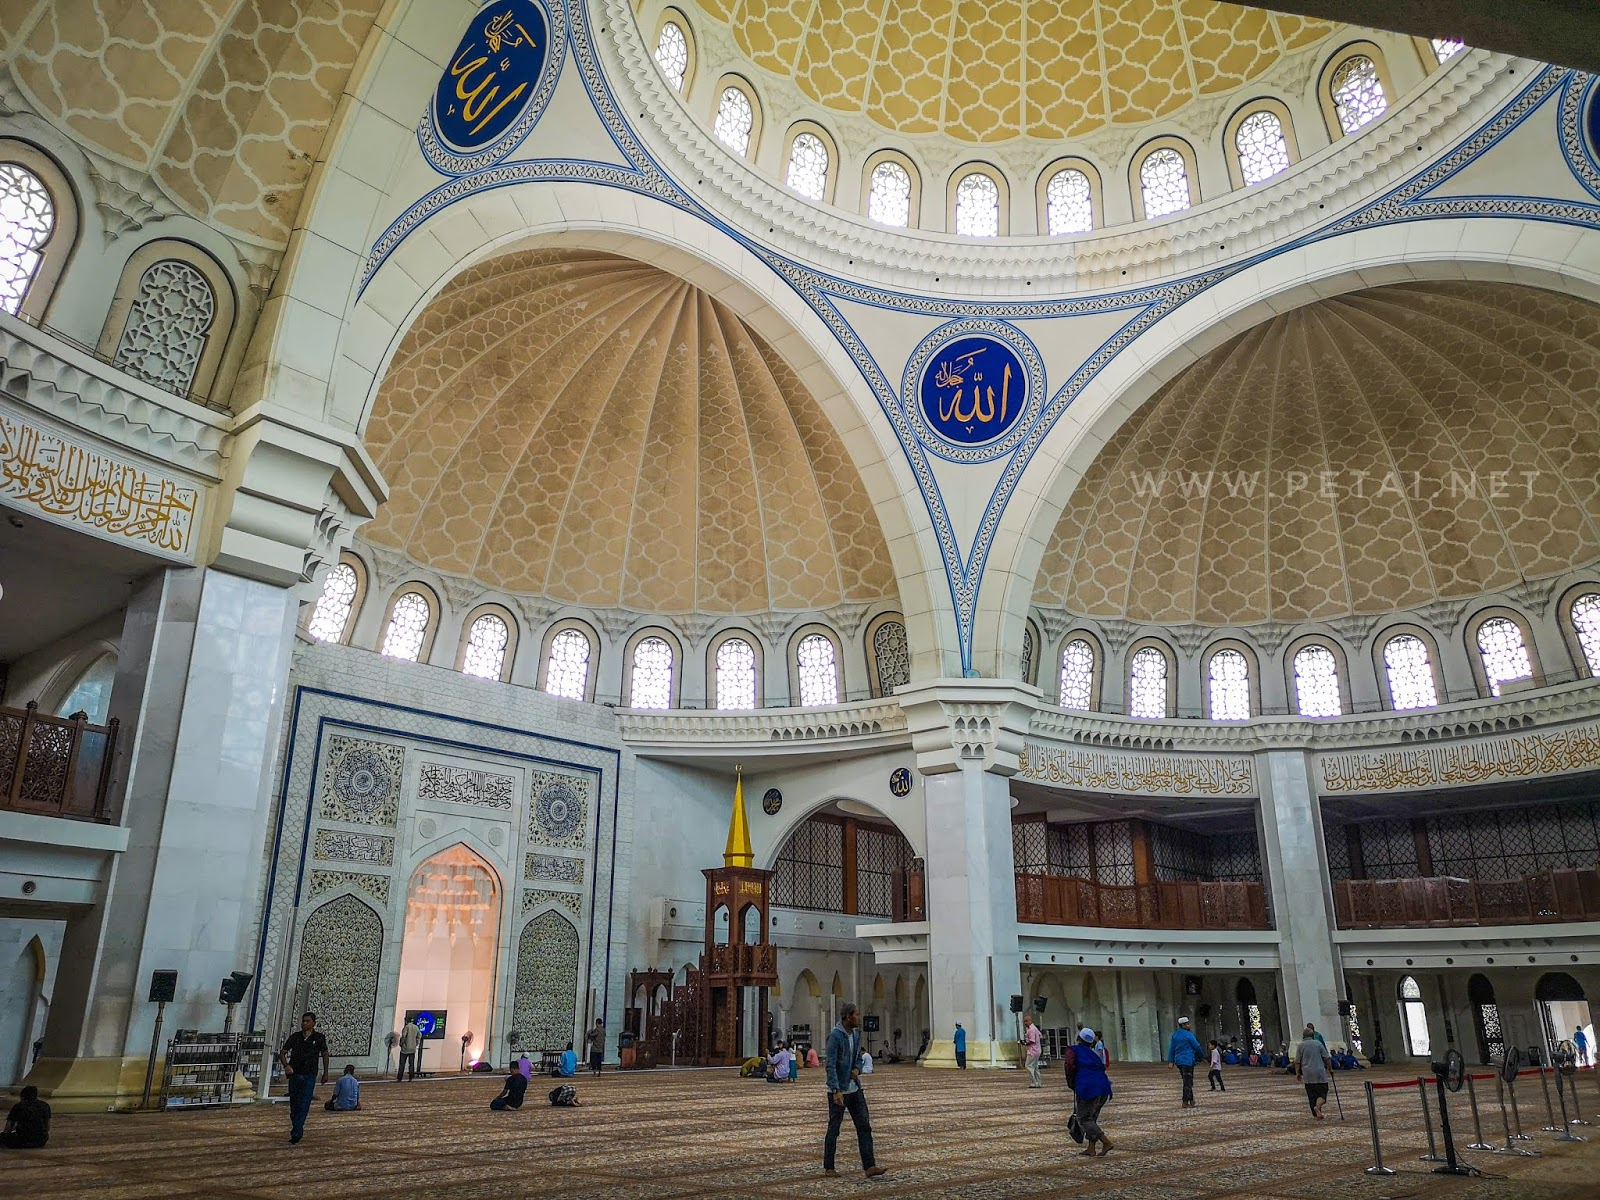 Masjid Wilayah Persekutuan Kuala Lumpur - pandangan sudut